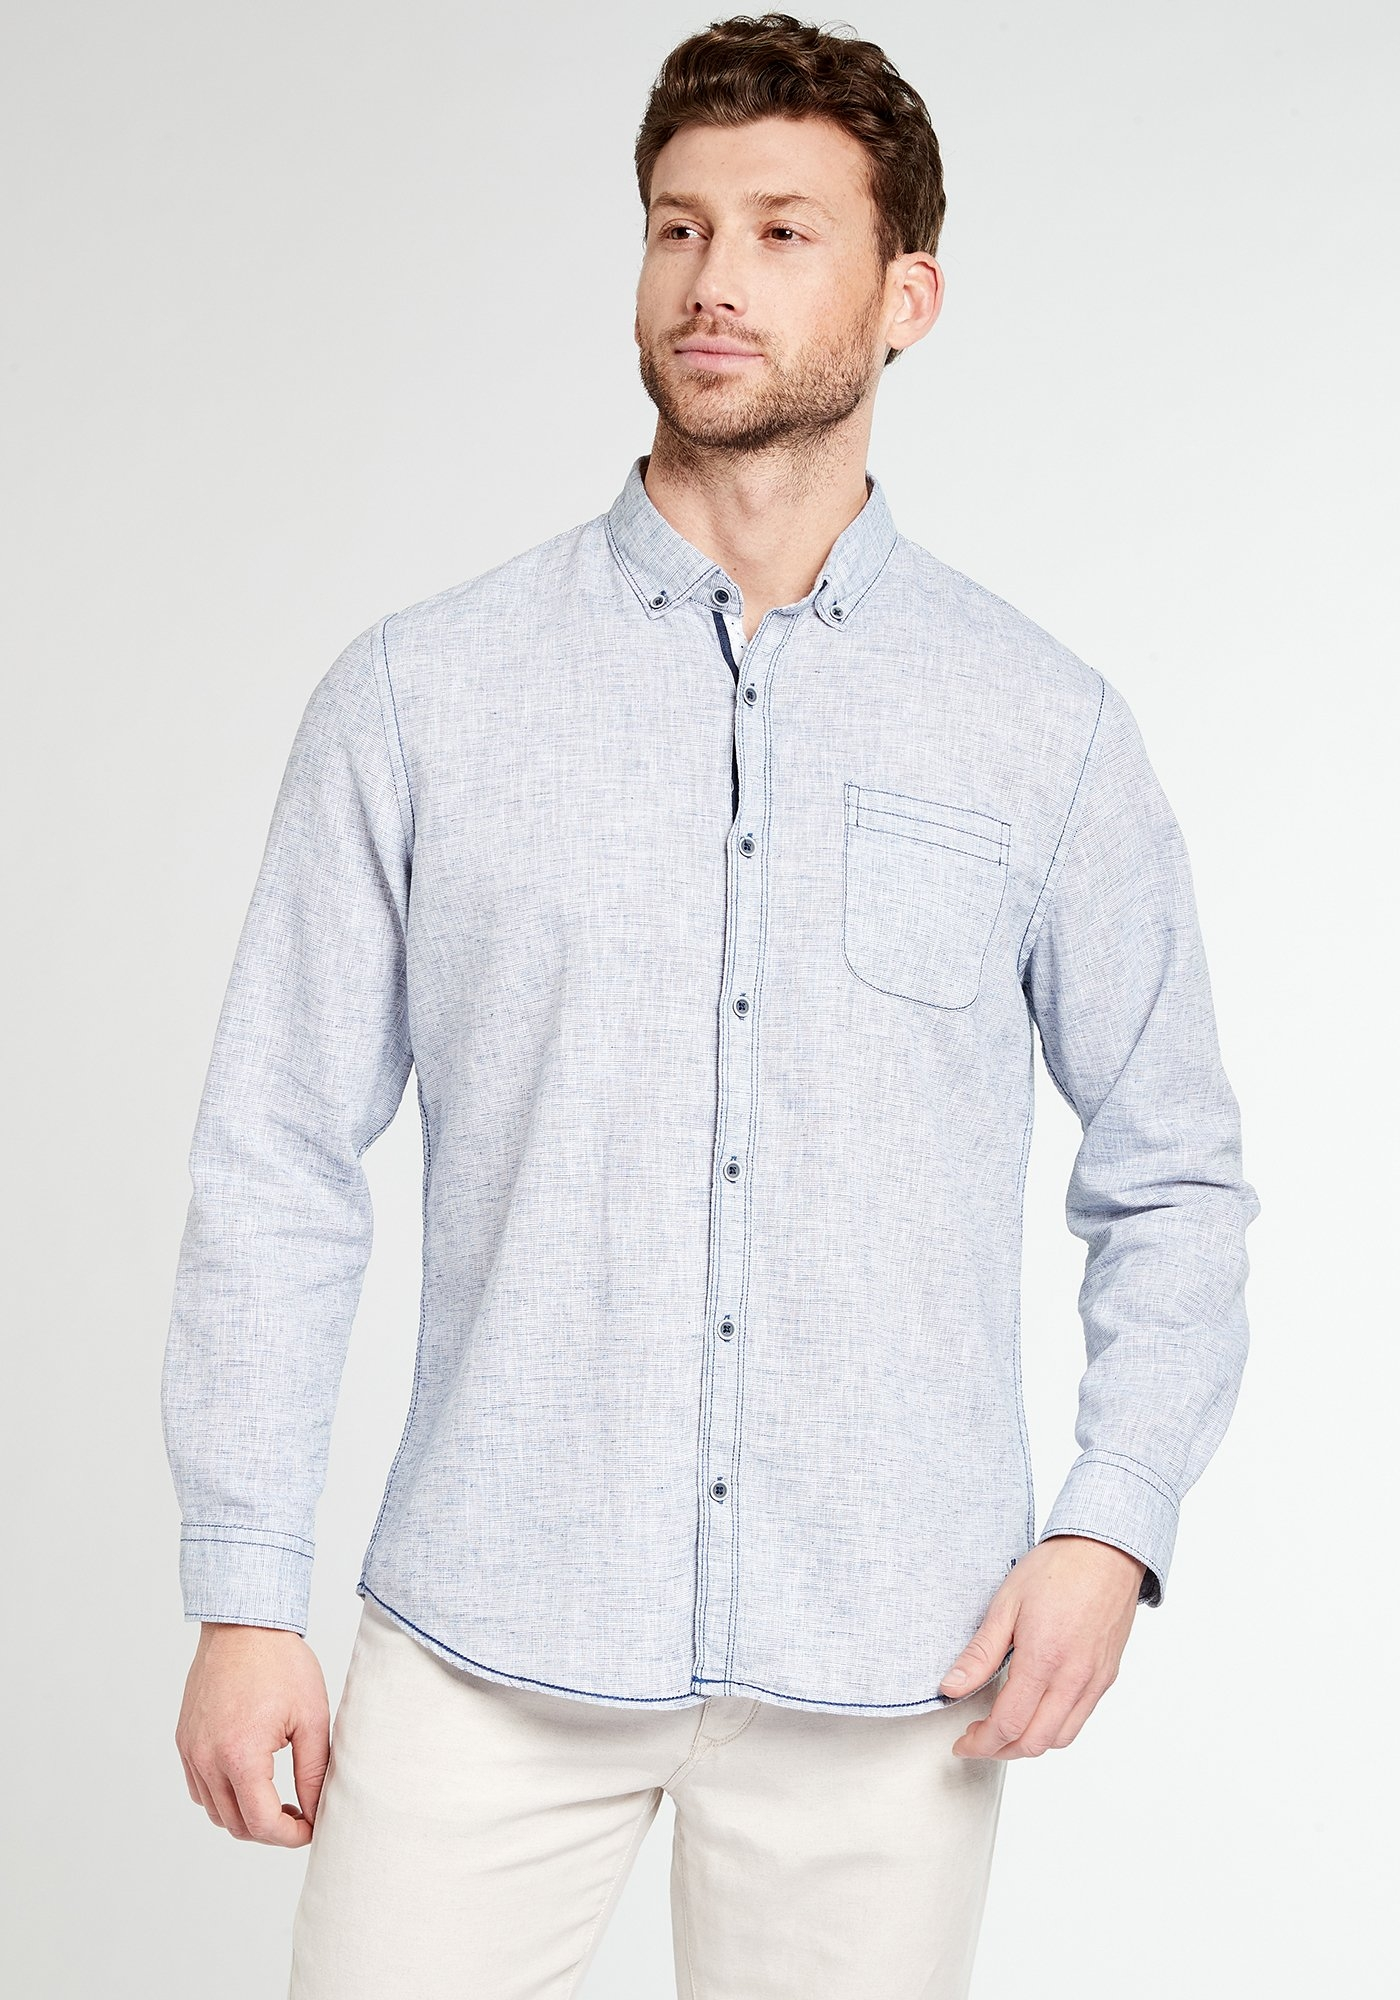 Heren Overhemd Casual.Pioneer Herenoverhemd Herenoverhemd Shirt Makkelijk Gevonden Otto